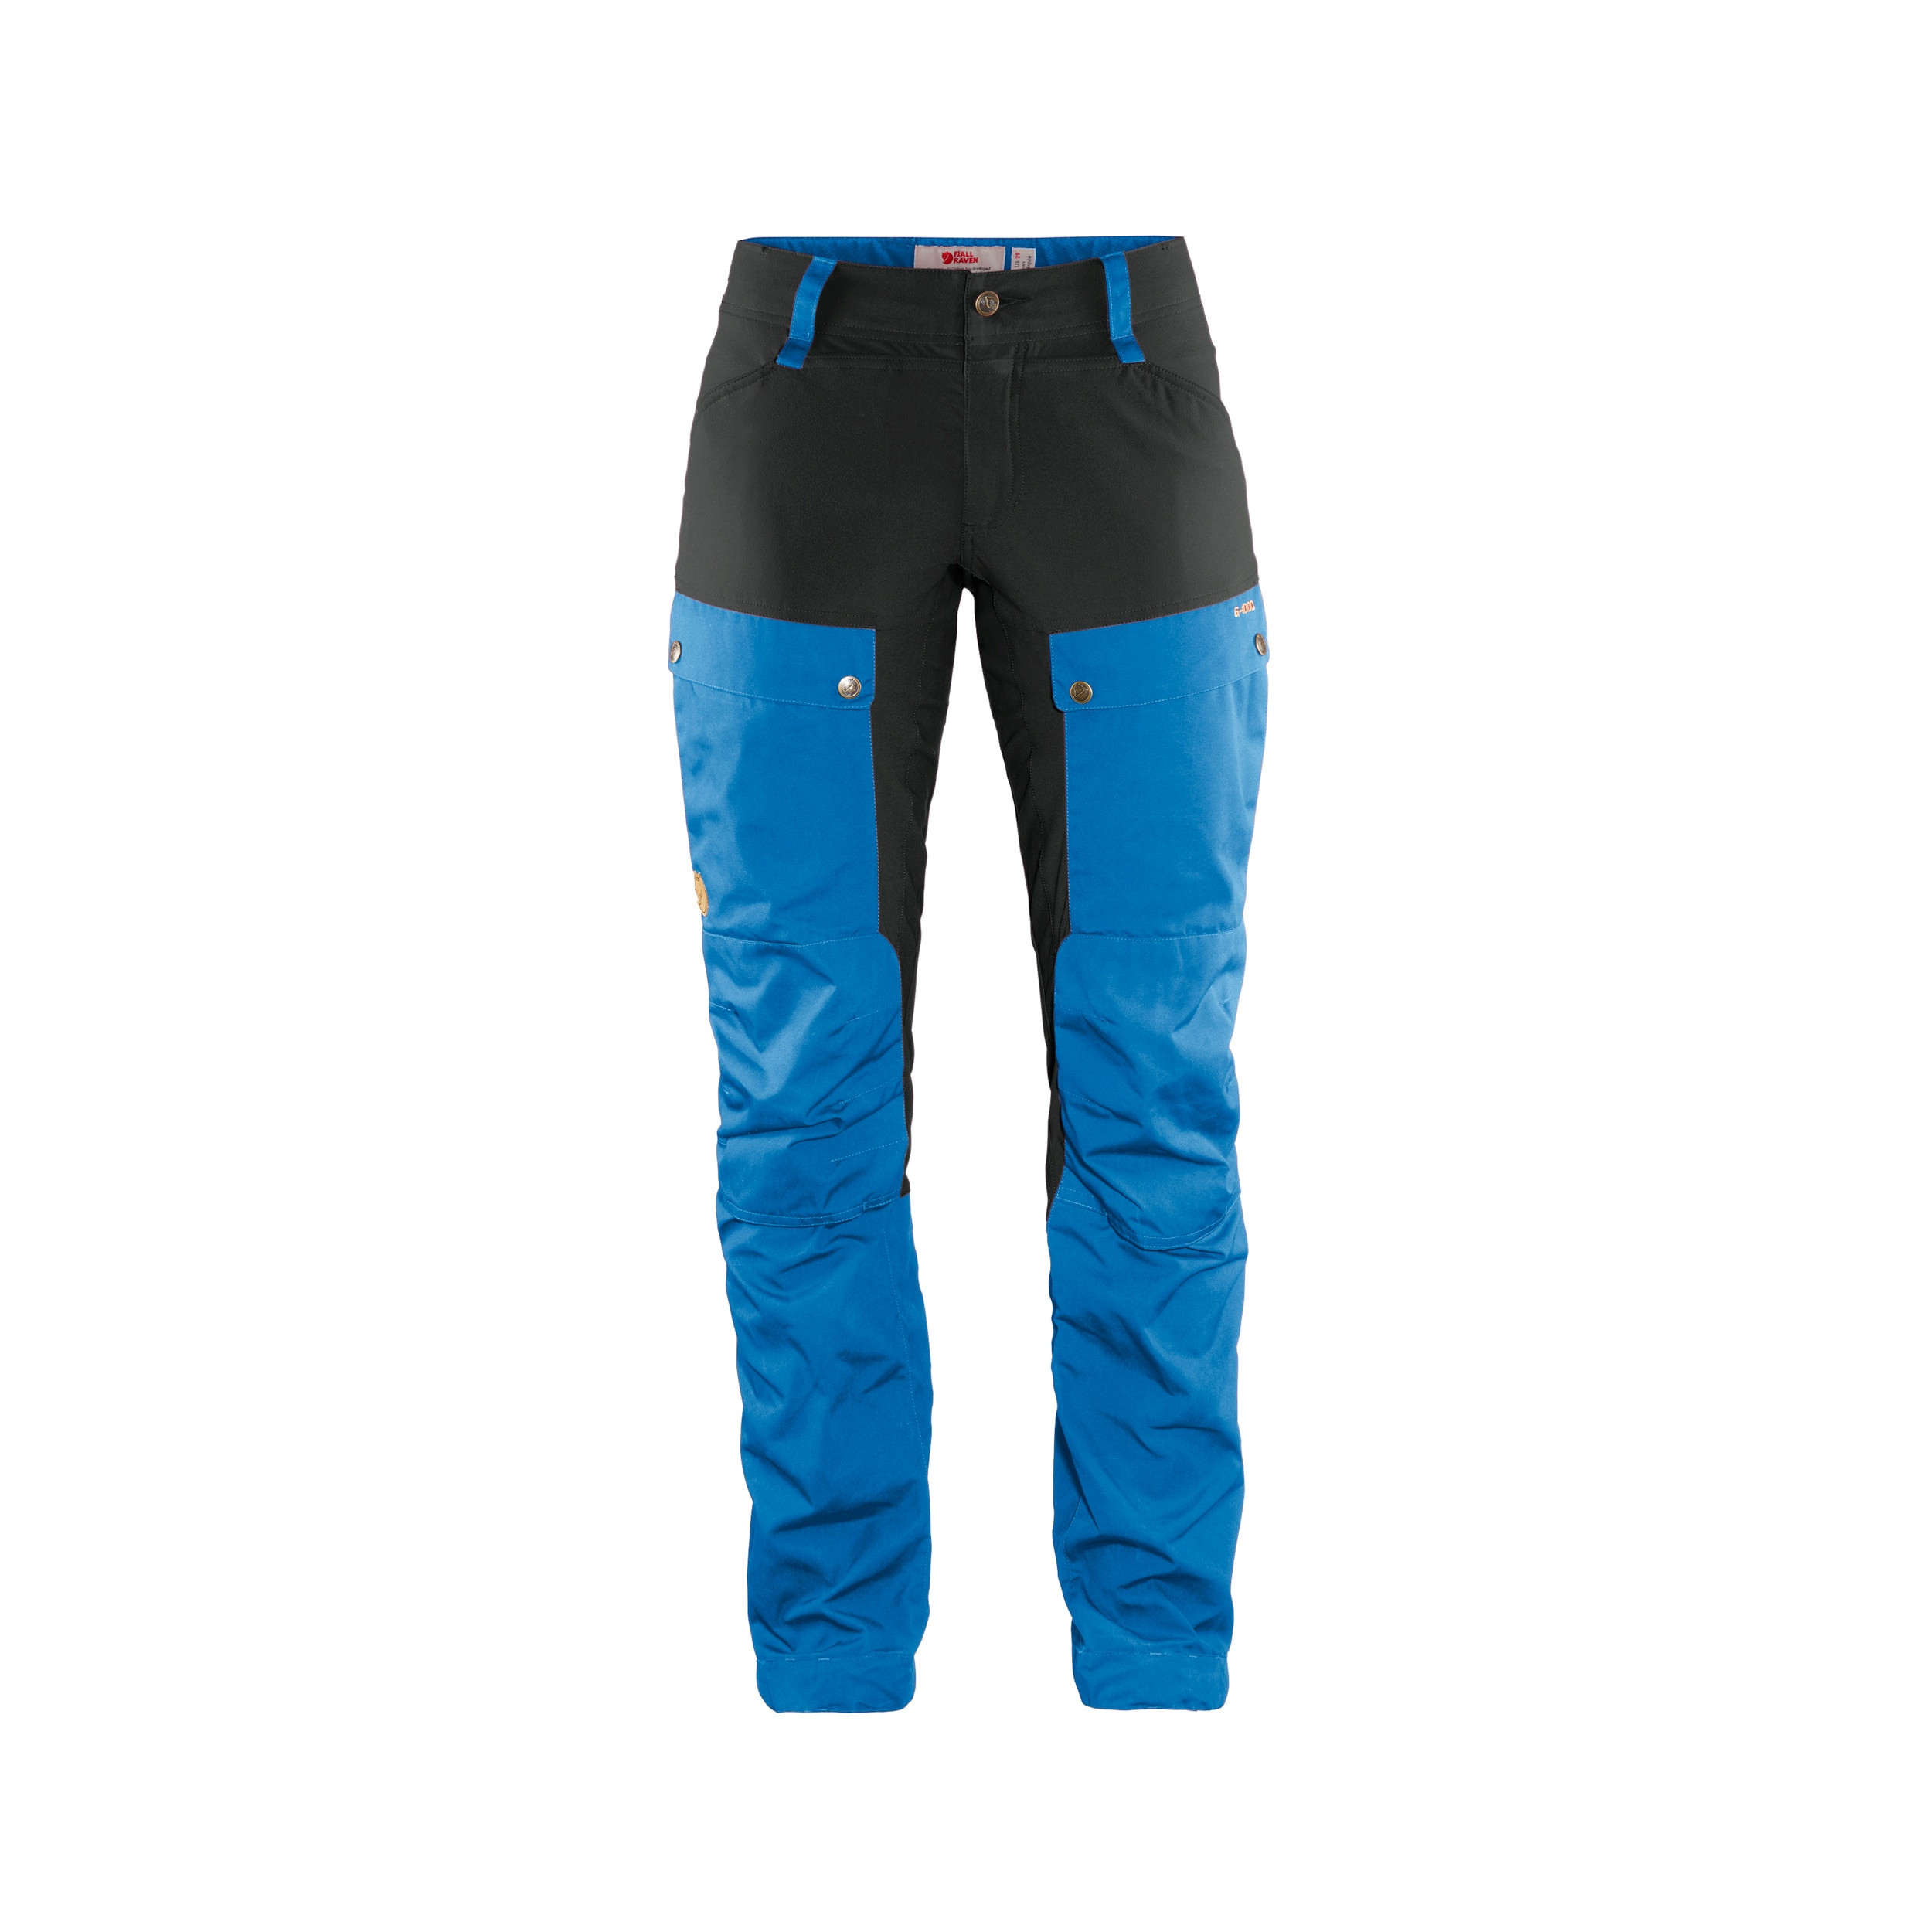 Fjällräven KEB Trousers Curved Short, W's